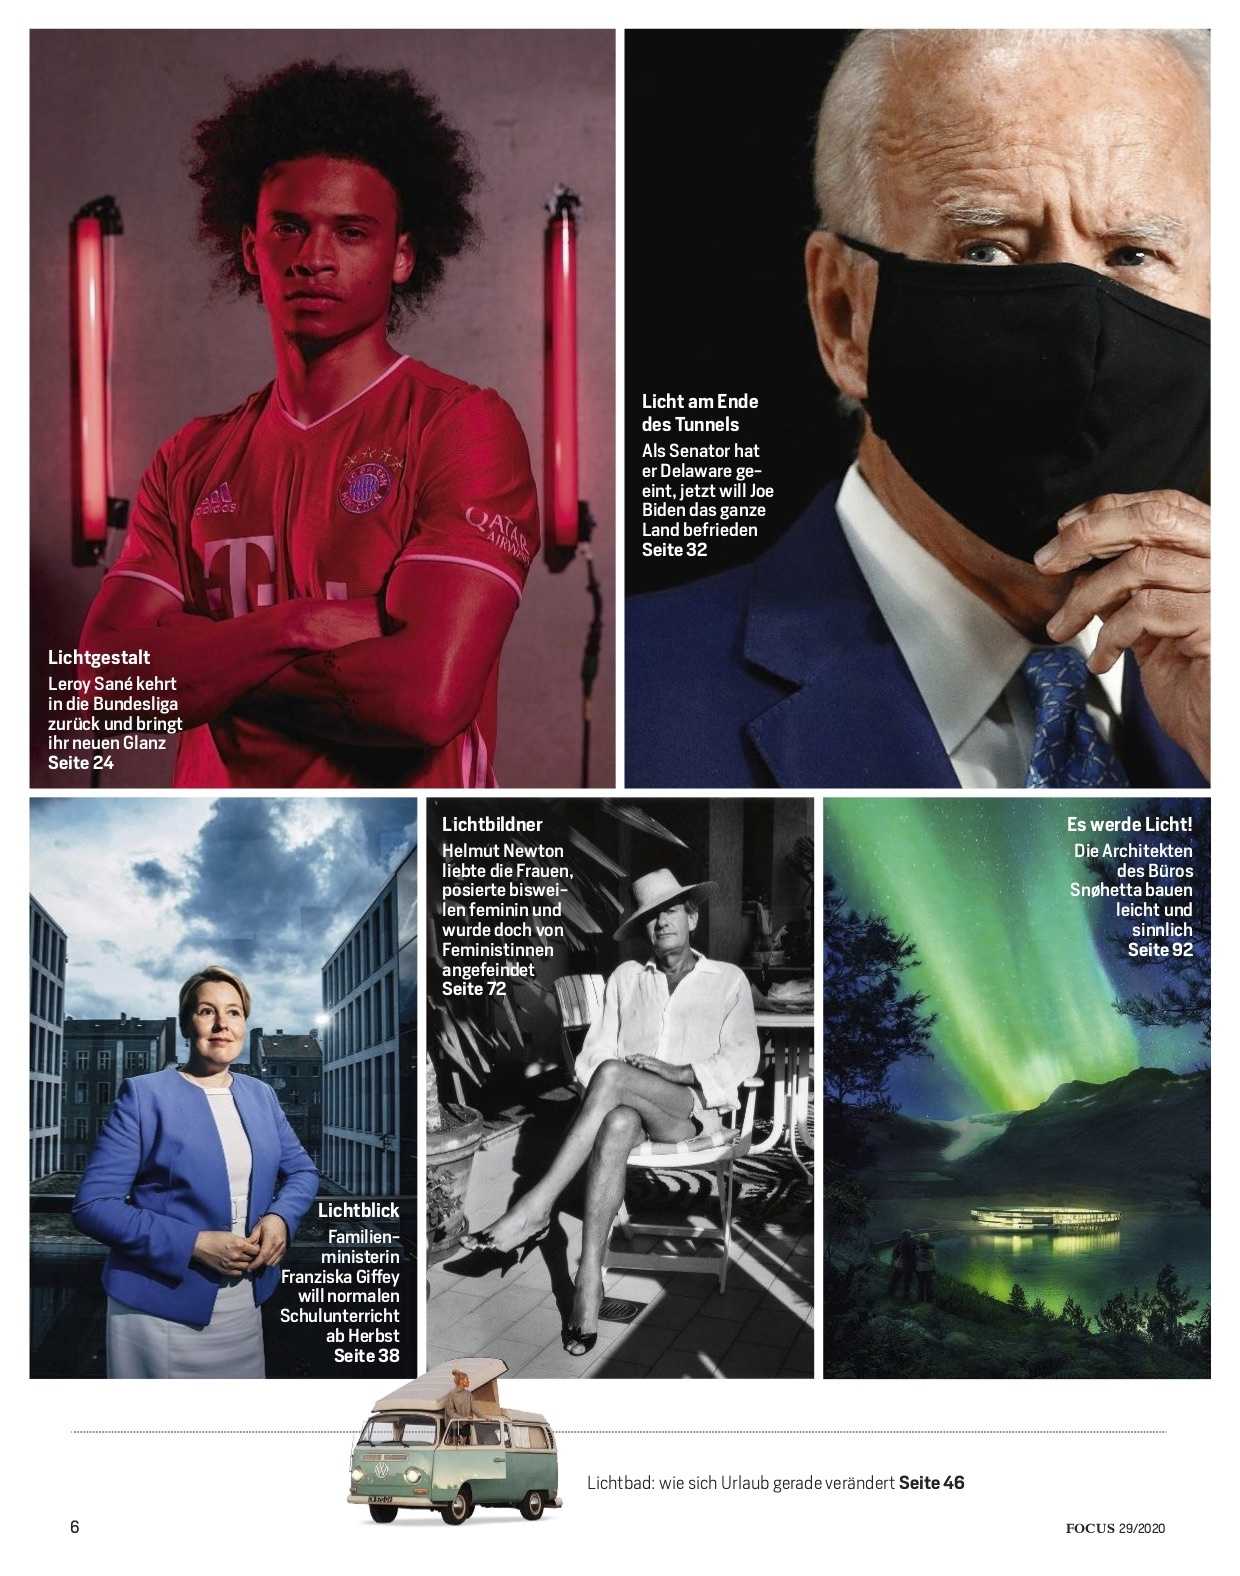 FOCUS Magazin FOCUS Magazin - Die neue Plage